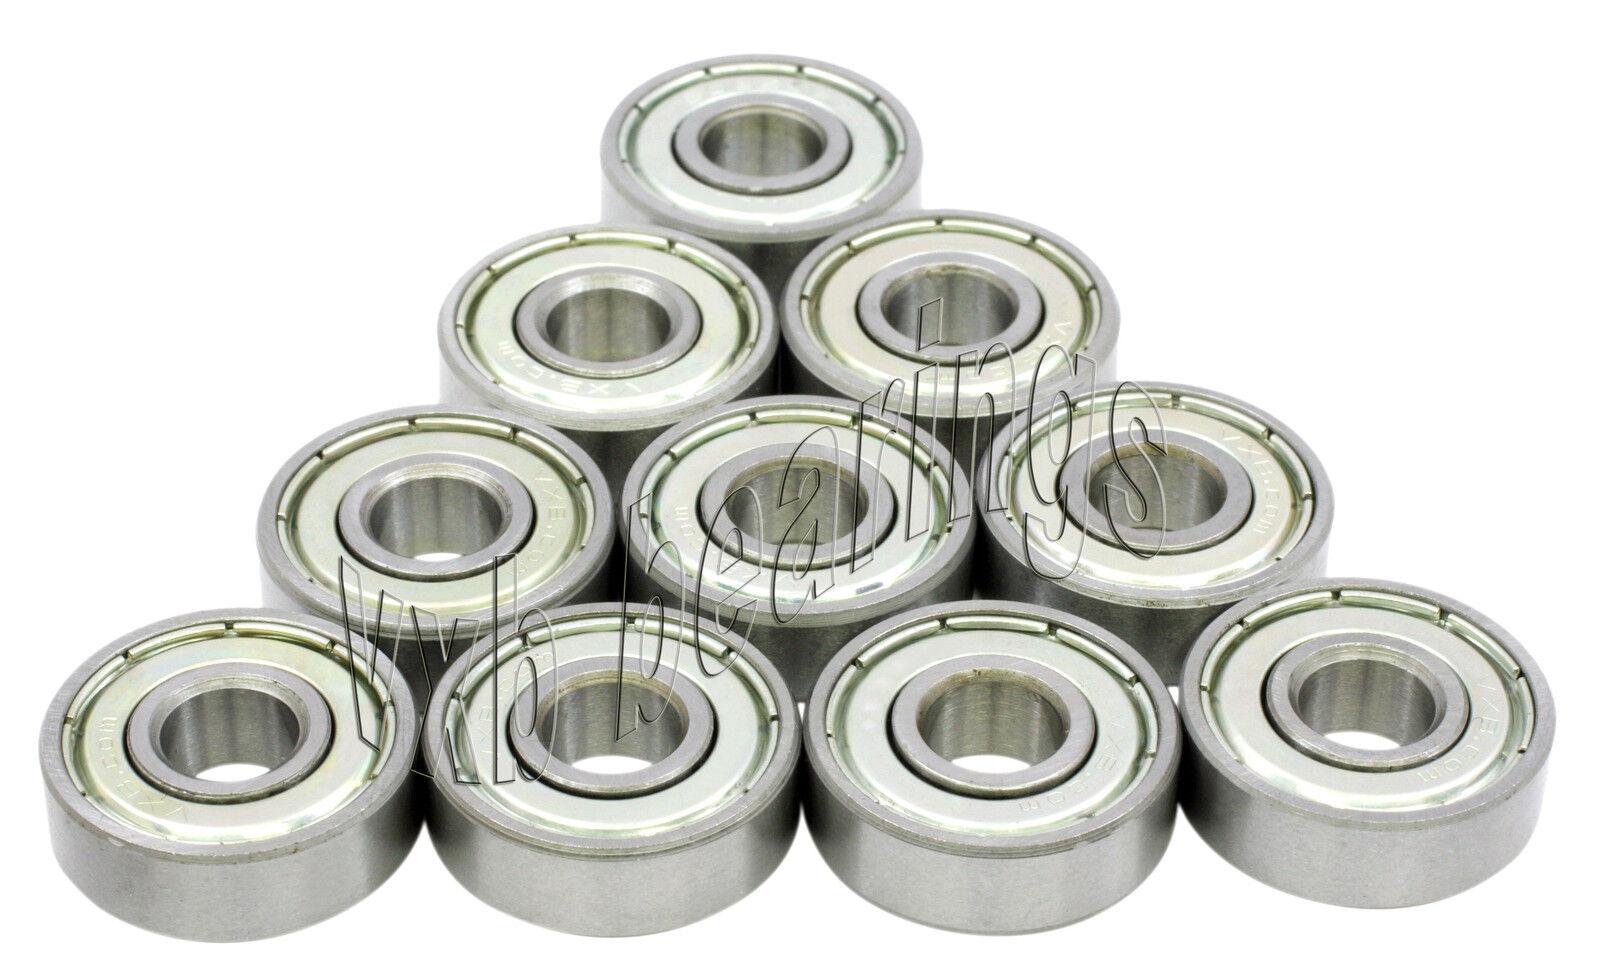 10 Fishing Reel 6500C3 Ceramic Ball Bearings ABU GARCIA 6500C3 Reel 997b8f